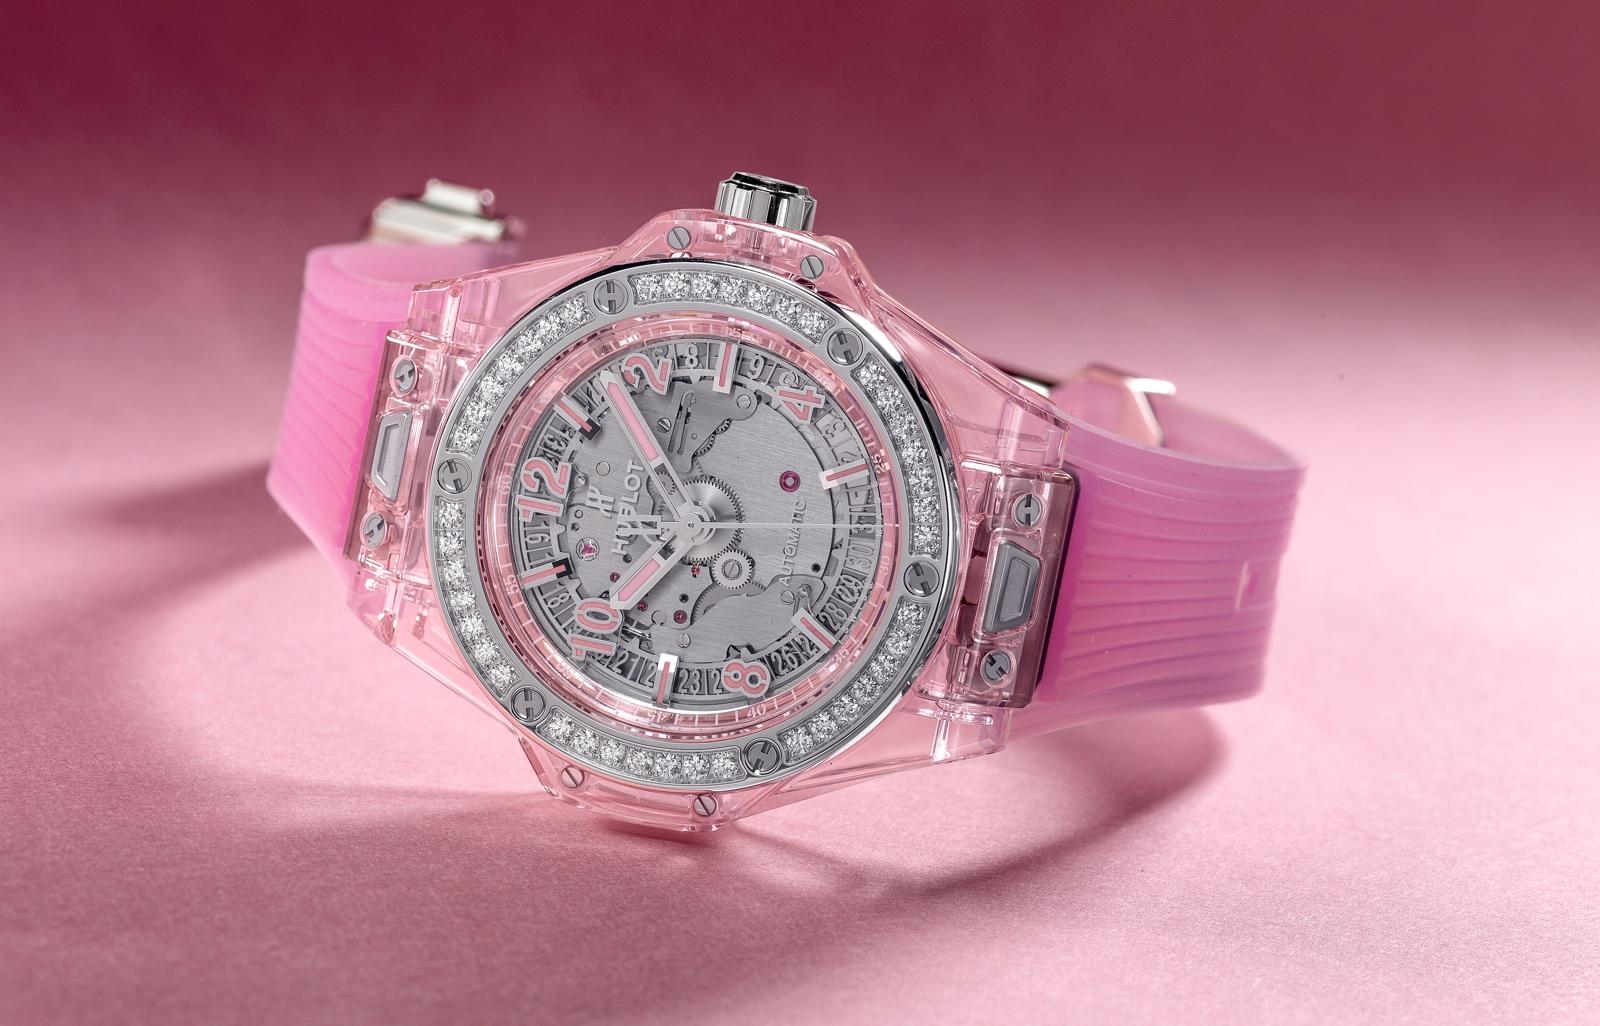 Hublot en Baselworld 2018 - Big Bang One Click Pink Sapphire